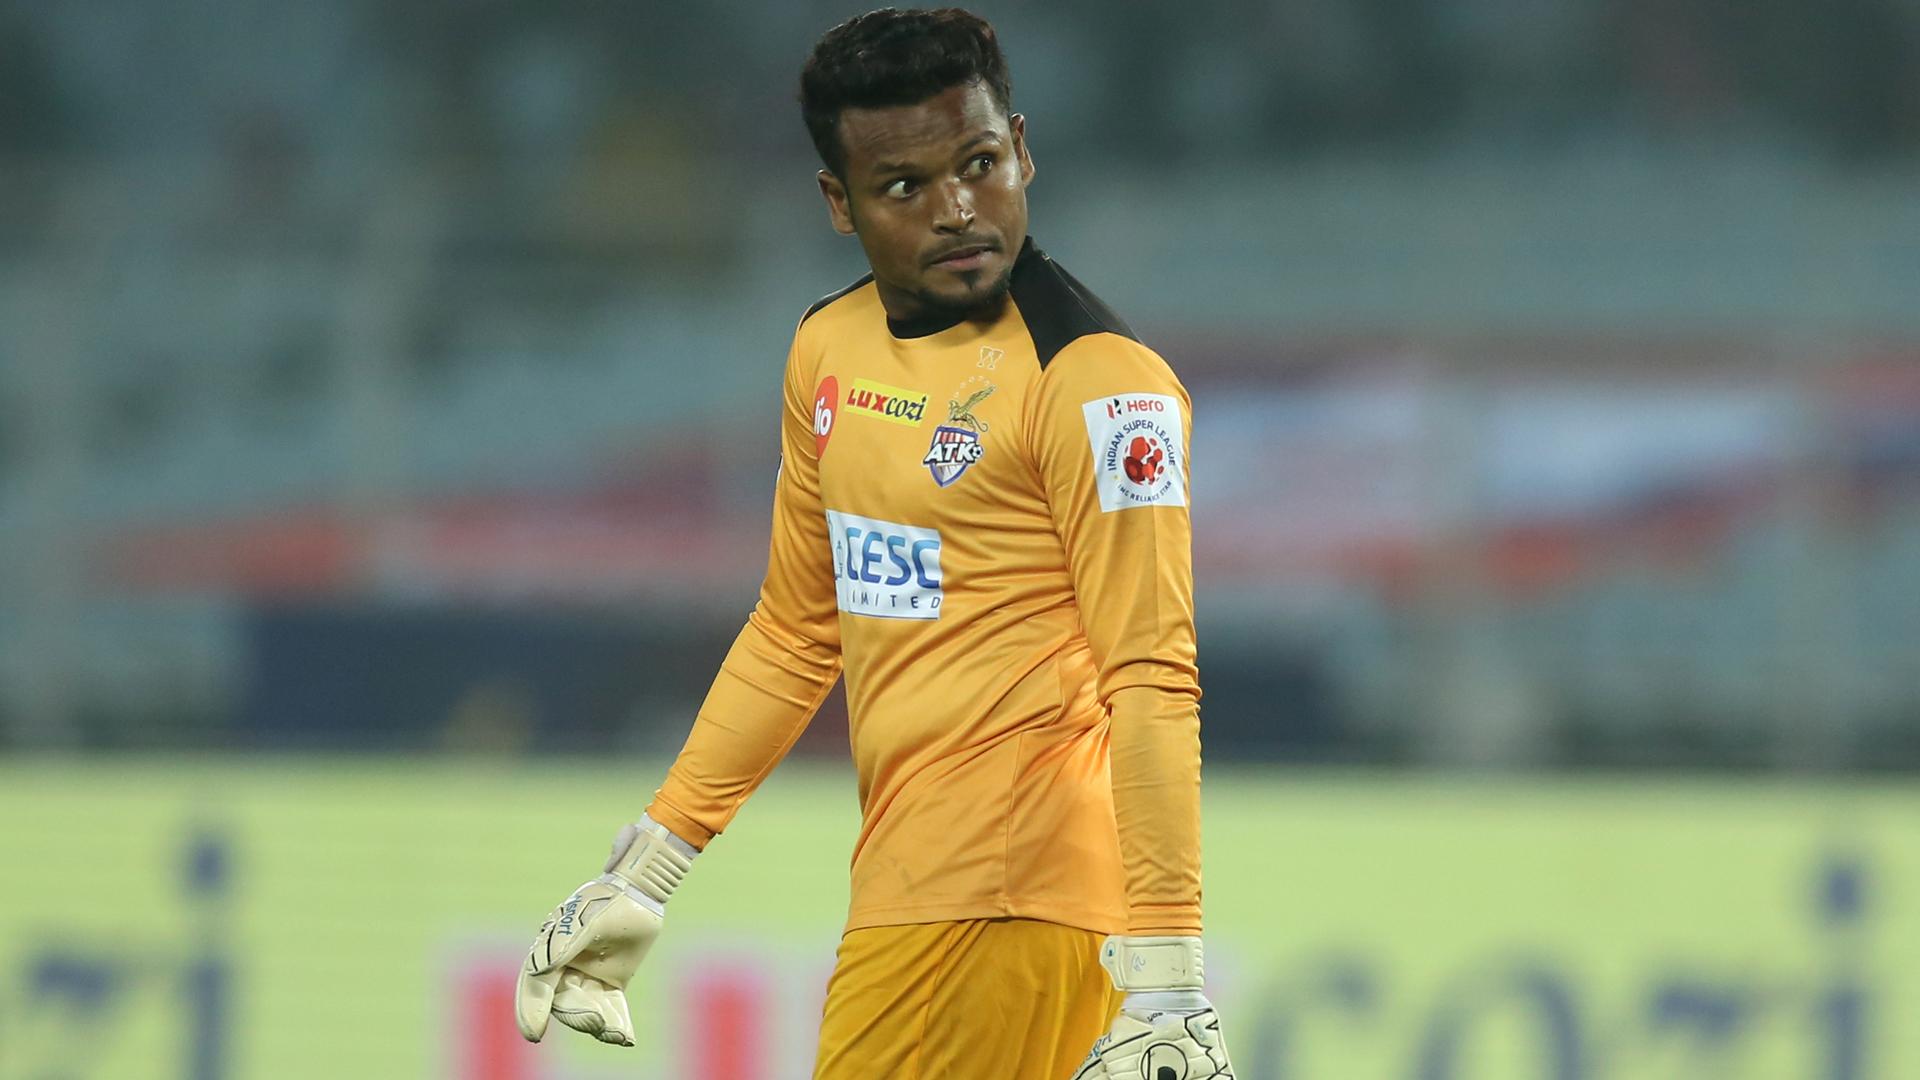 ISL: Mumbai City FC keep playoff hopes alive with win over ATK